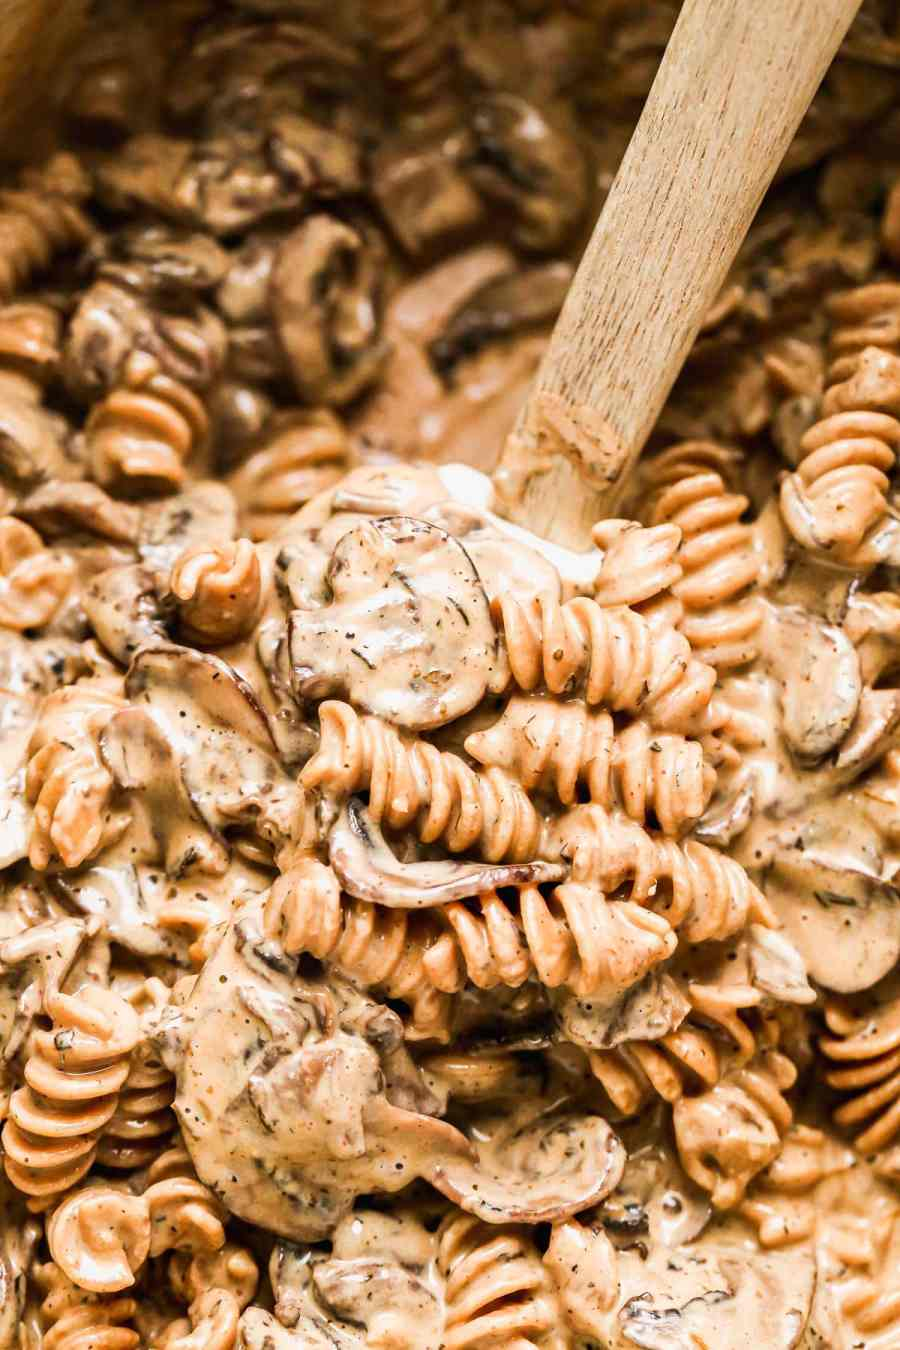 Creamy stroganoff with mushrooms